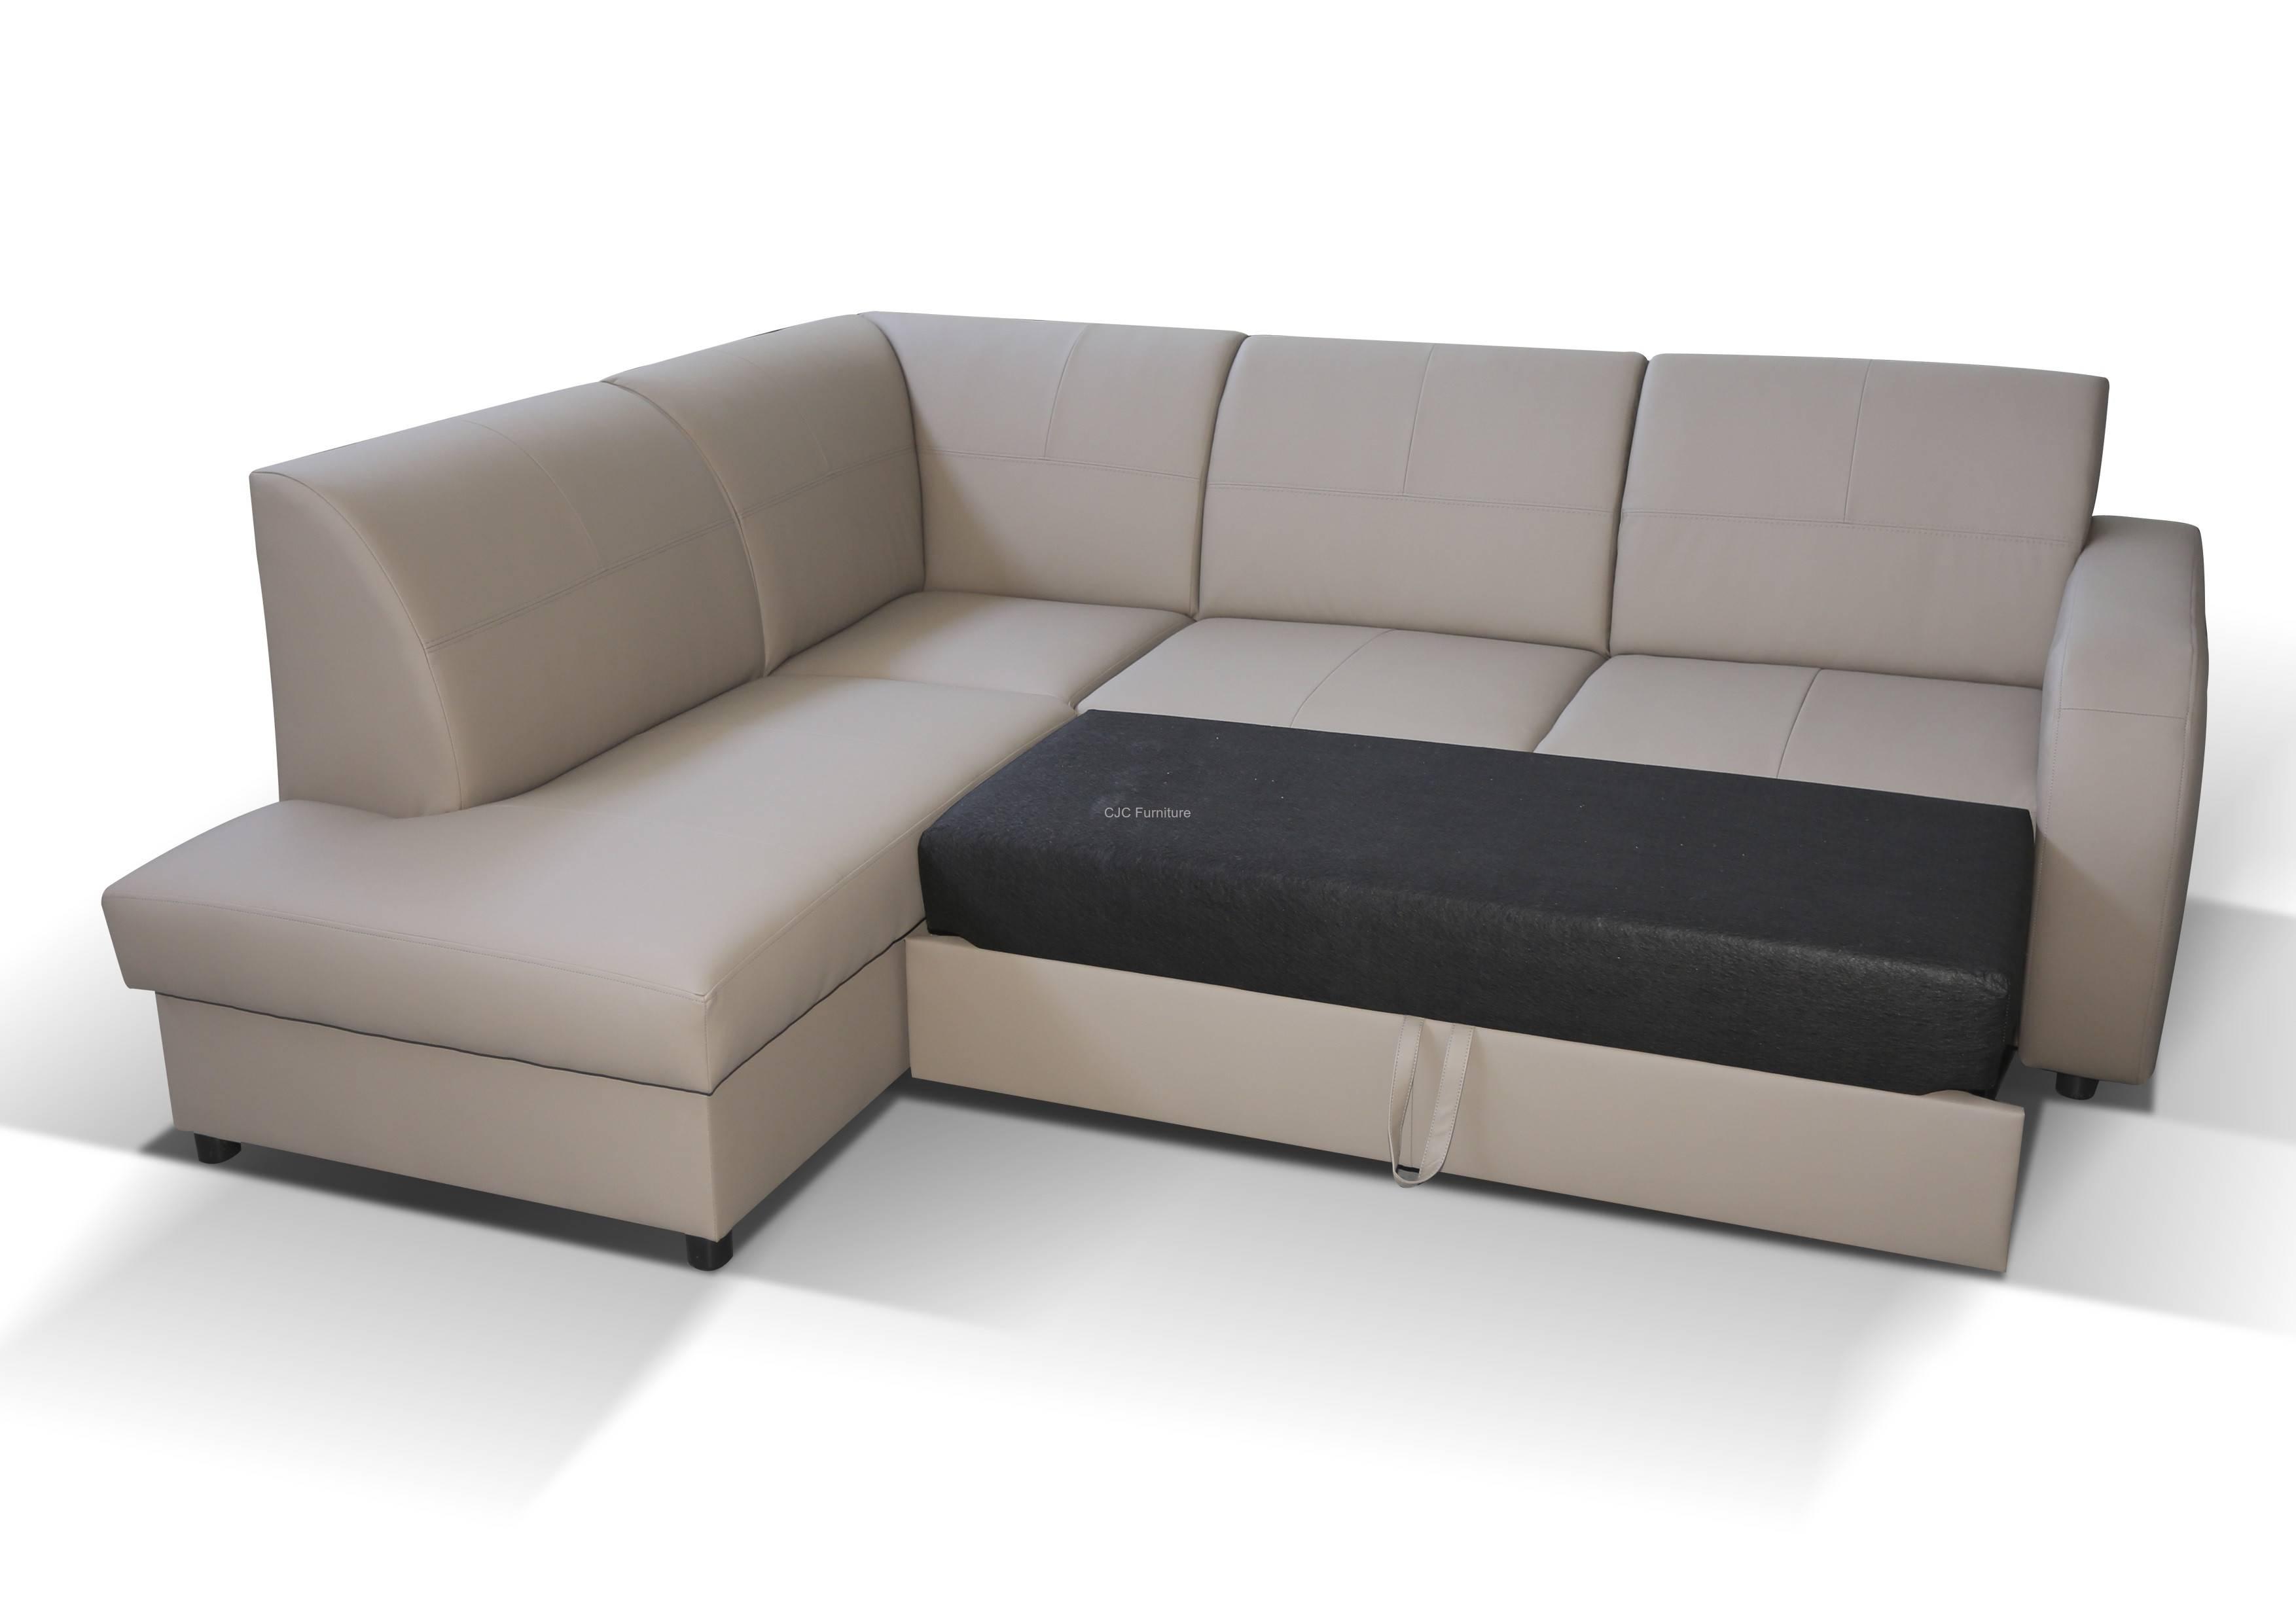 Corner Sleeper Sofa With Storage | Tehranmix Decoration throughout Corner Sleeper Sofas (Image 4 of 15)